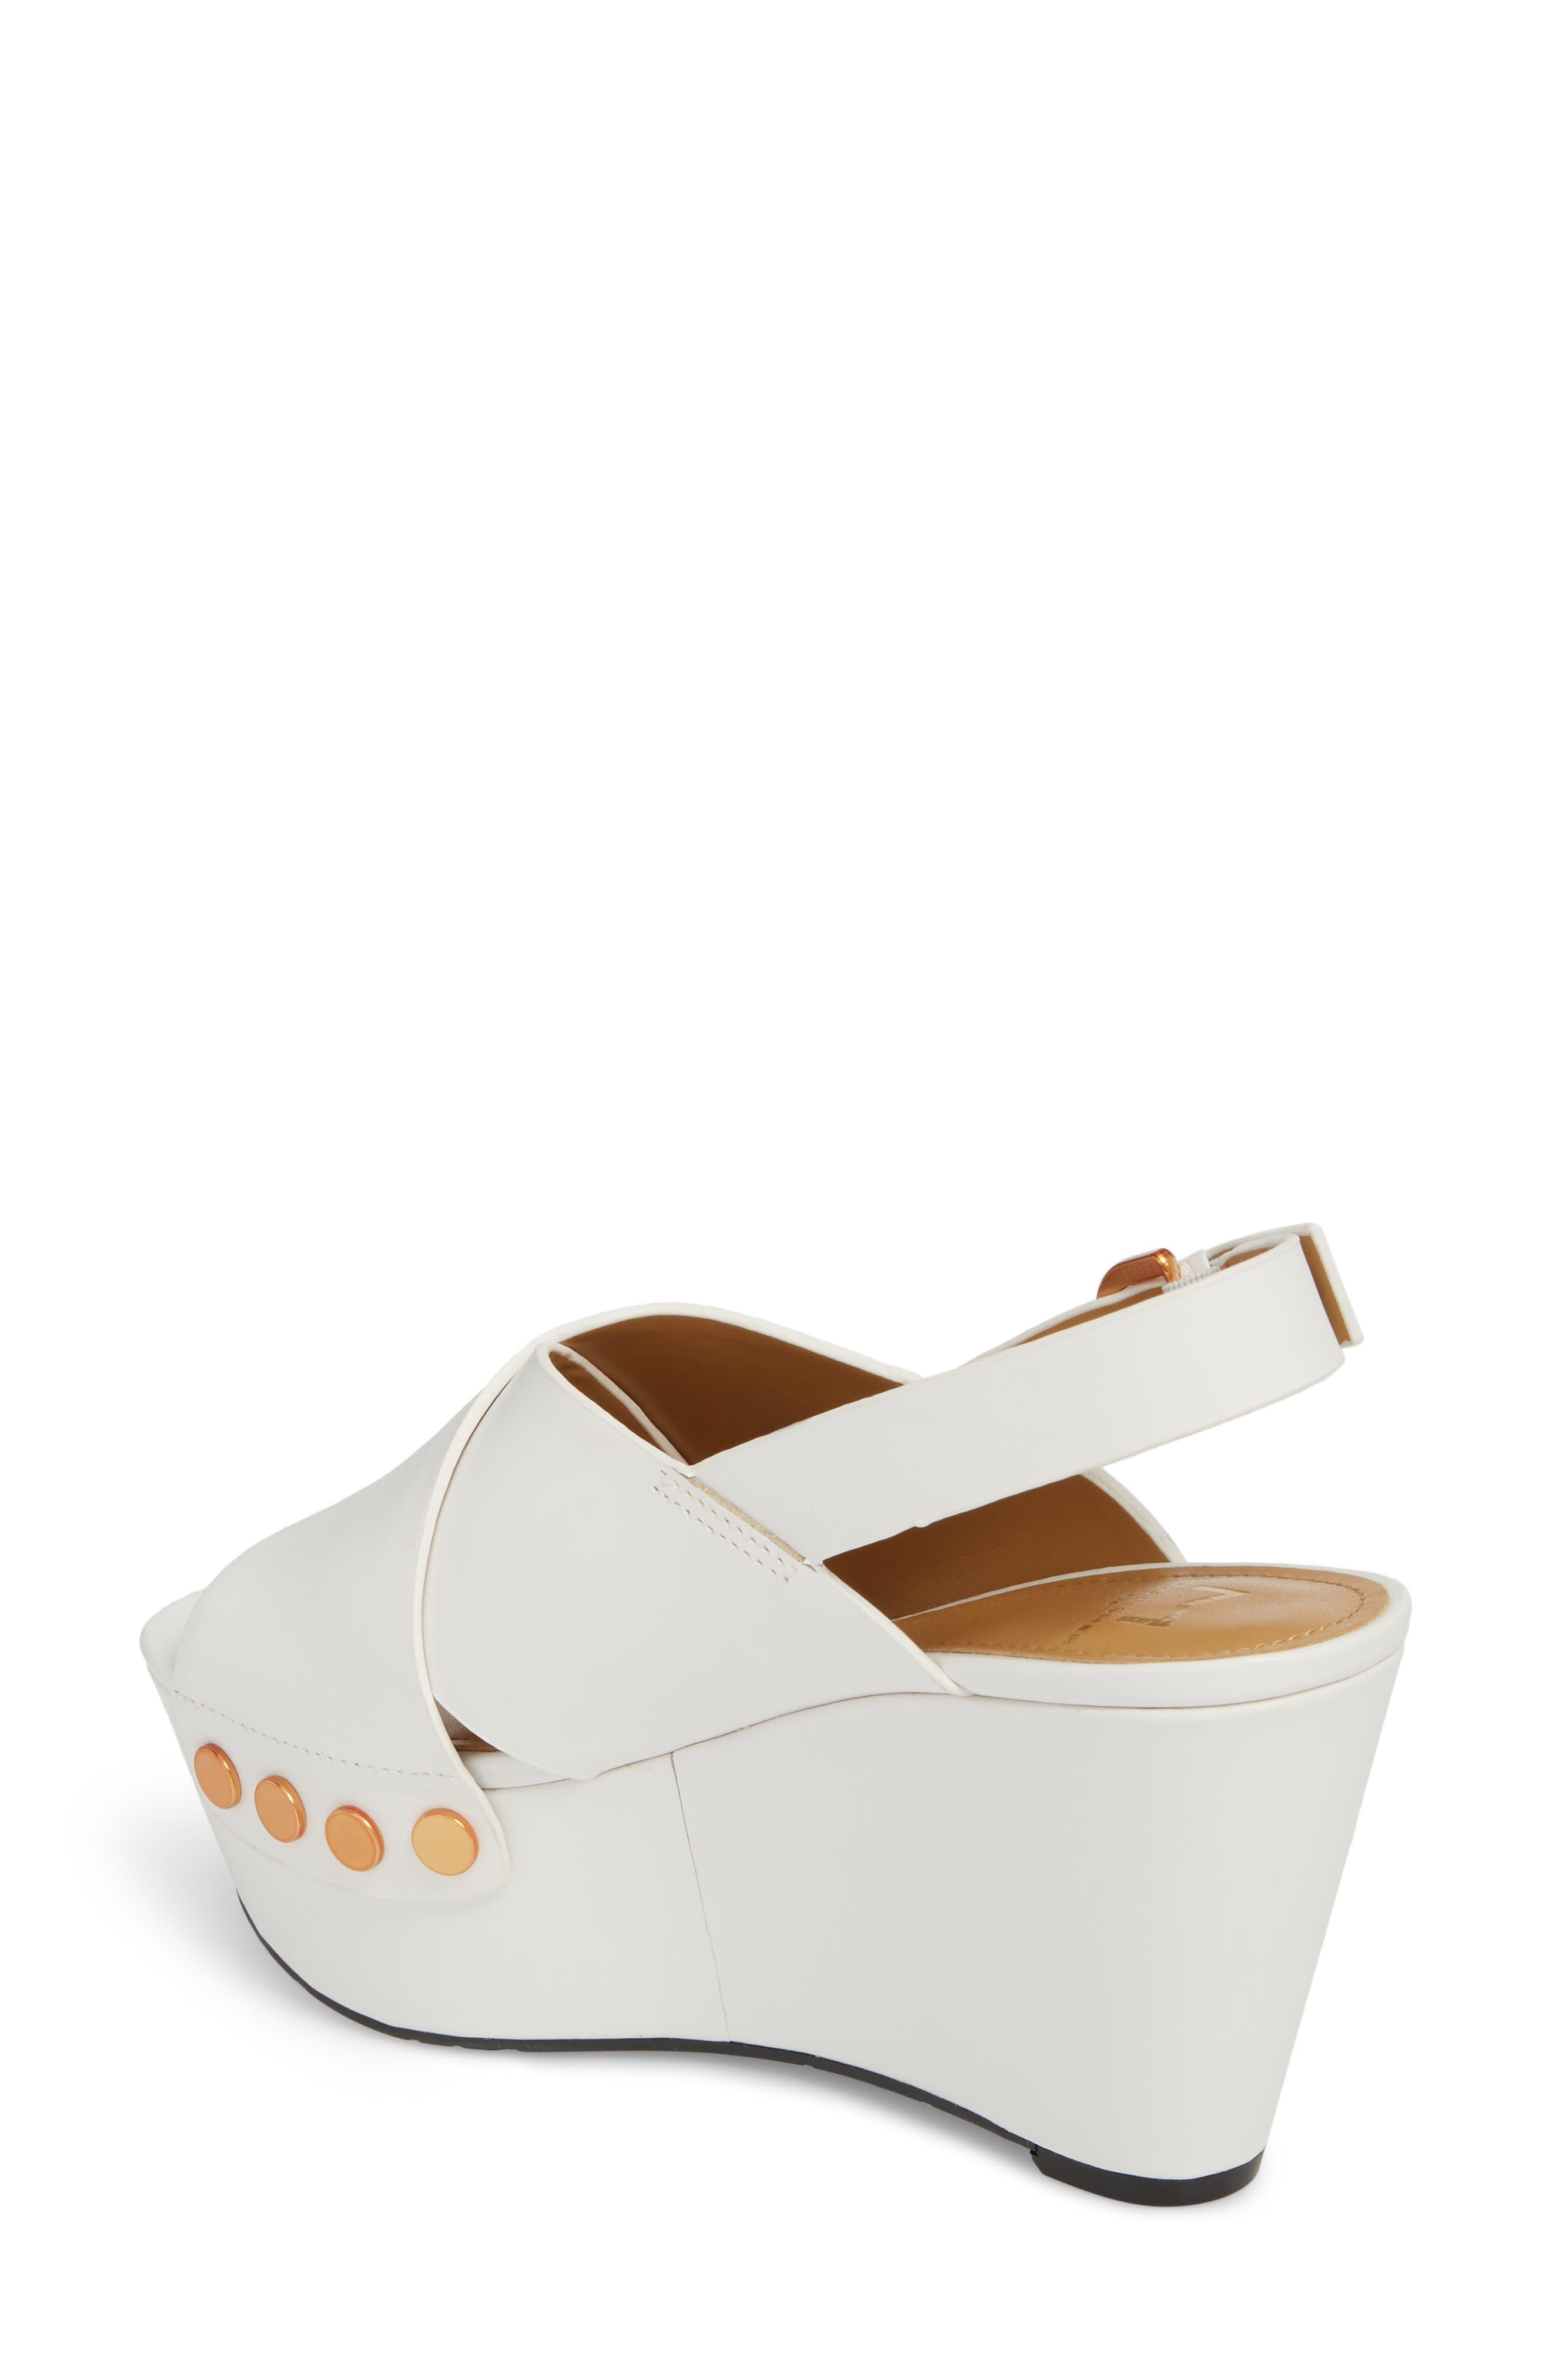 Barlow Wedge Sandal,                             Alternate thumbnail 2, color,                             White Leather